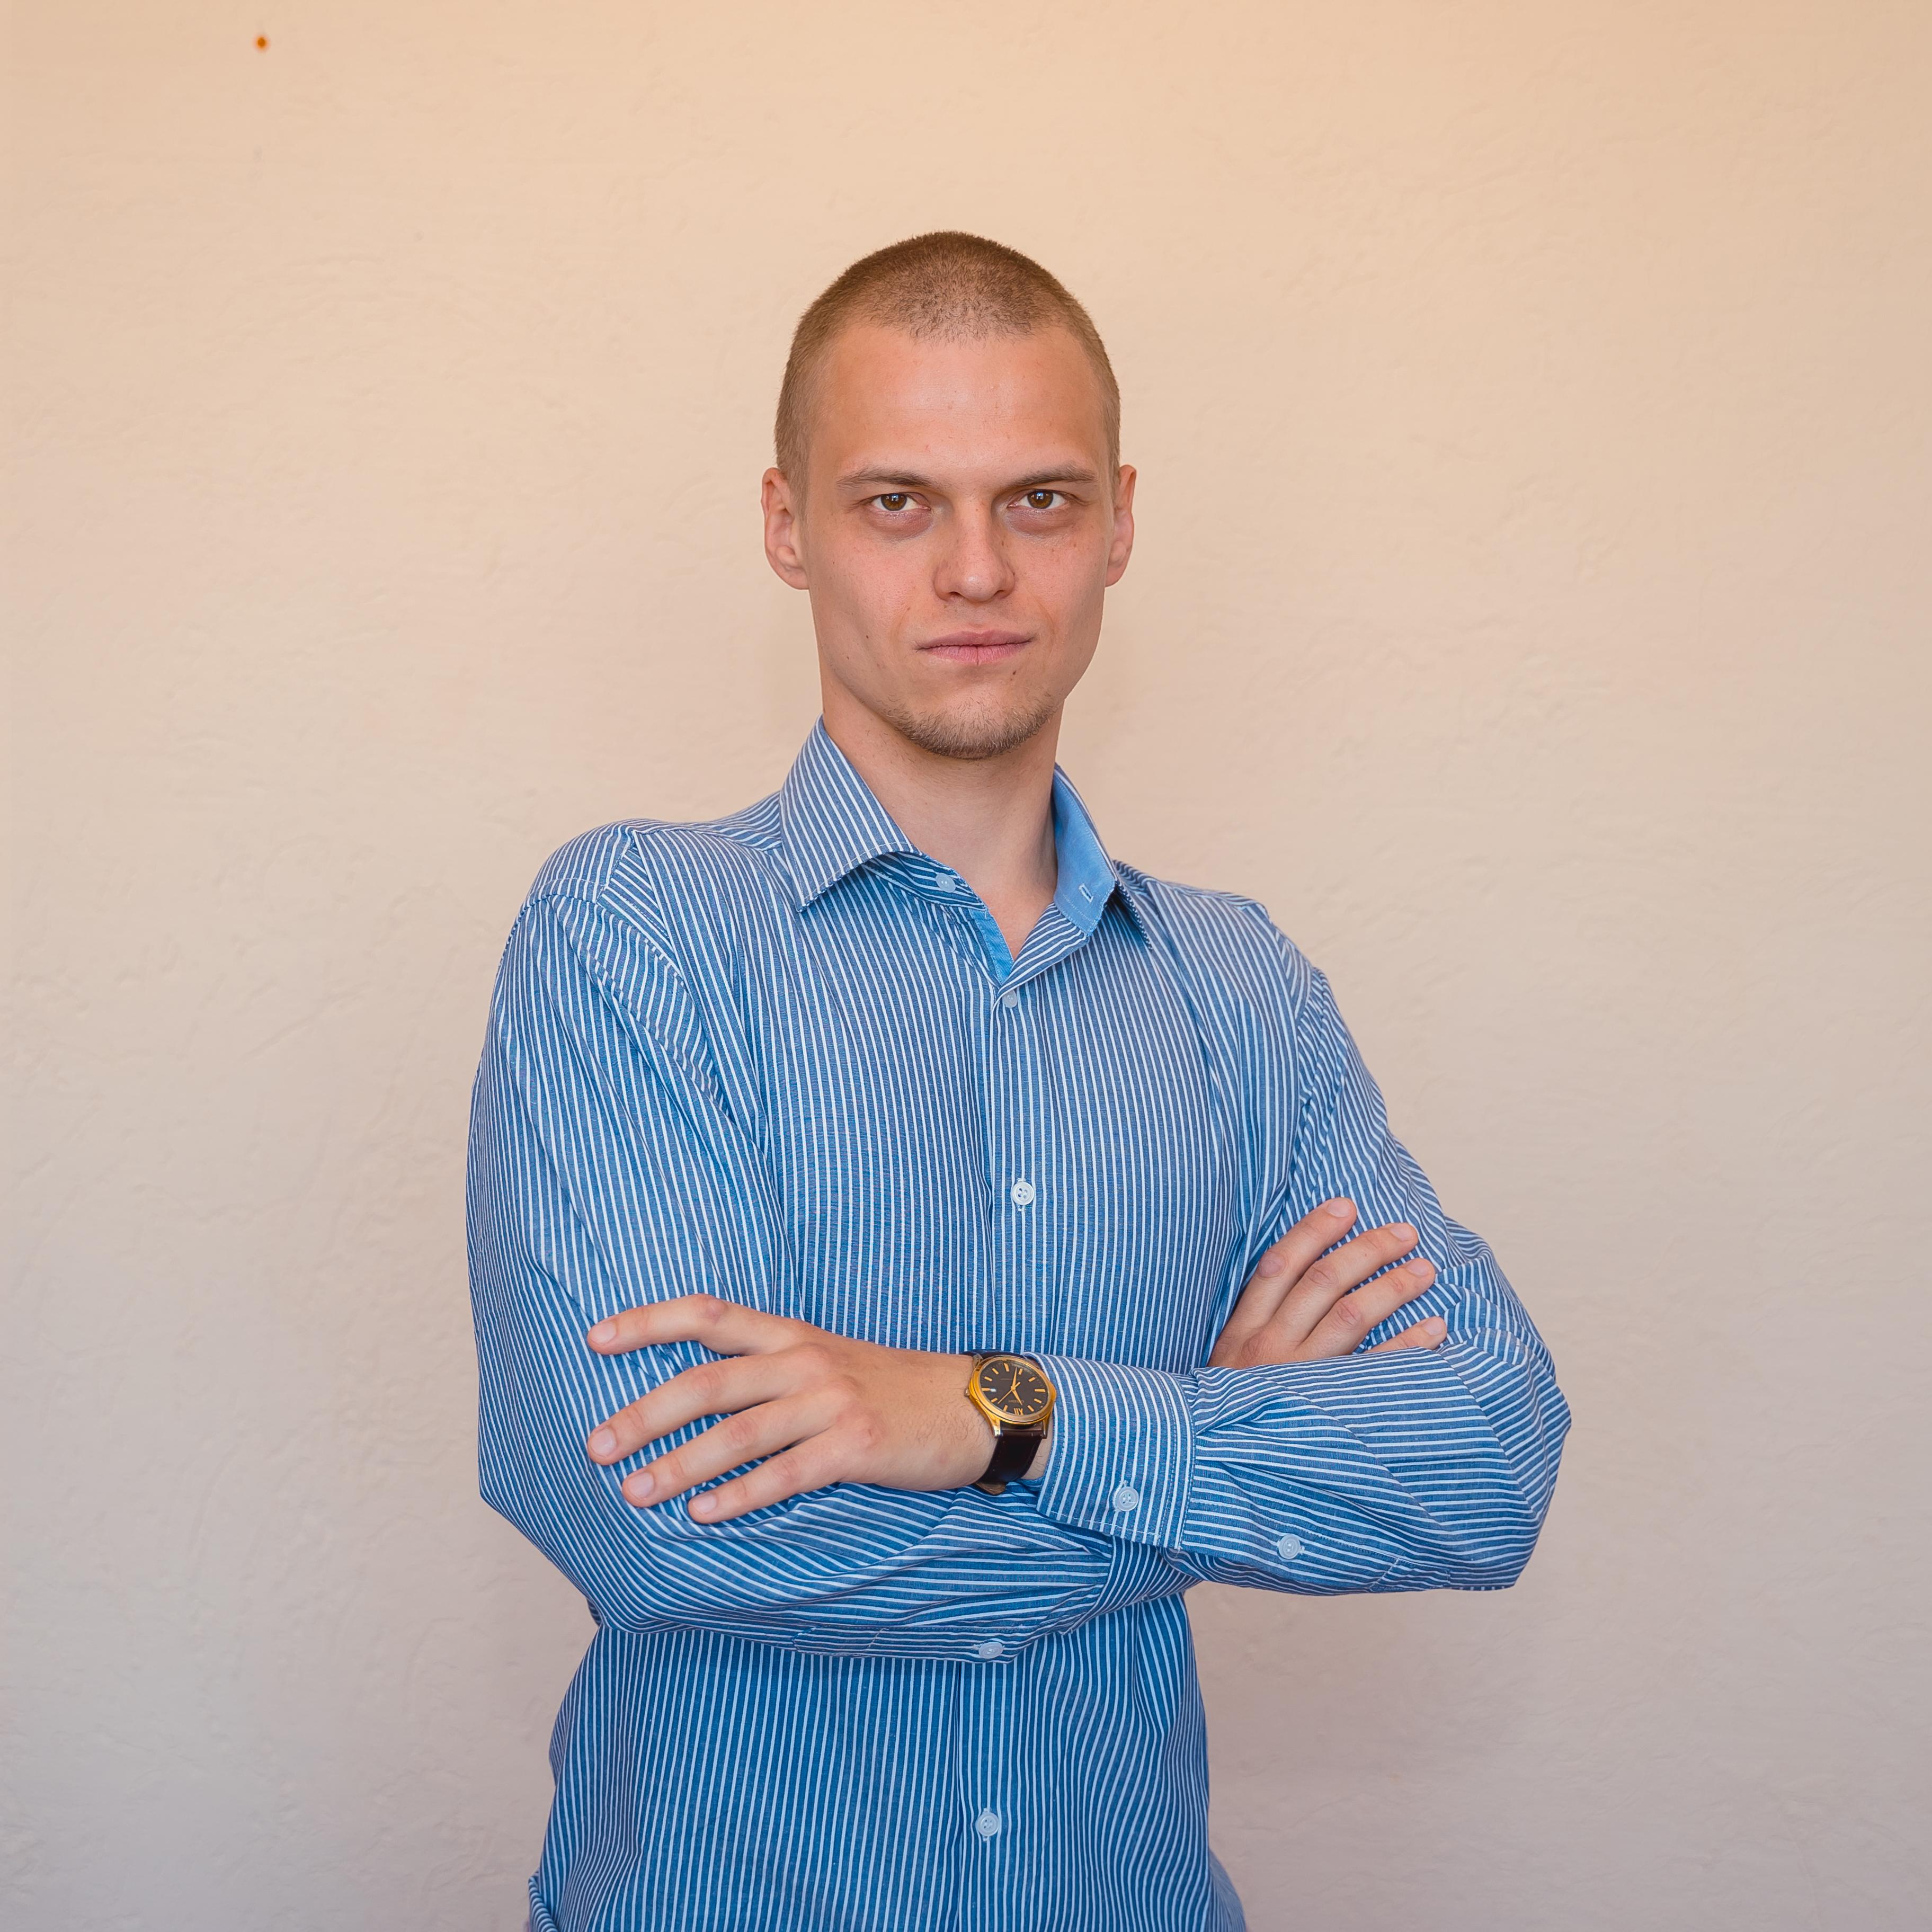 Юрий Дмитриевич Фалалеев